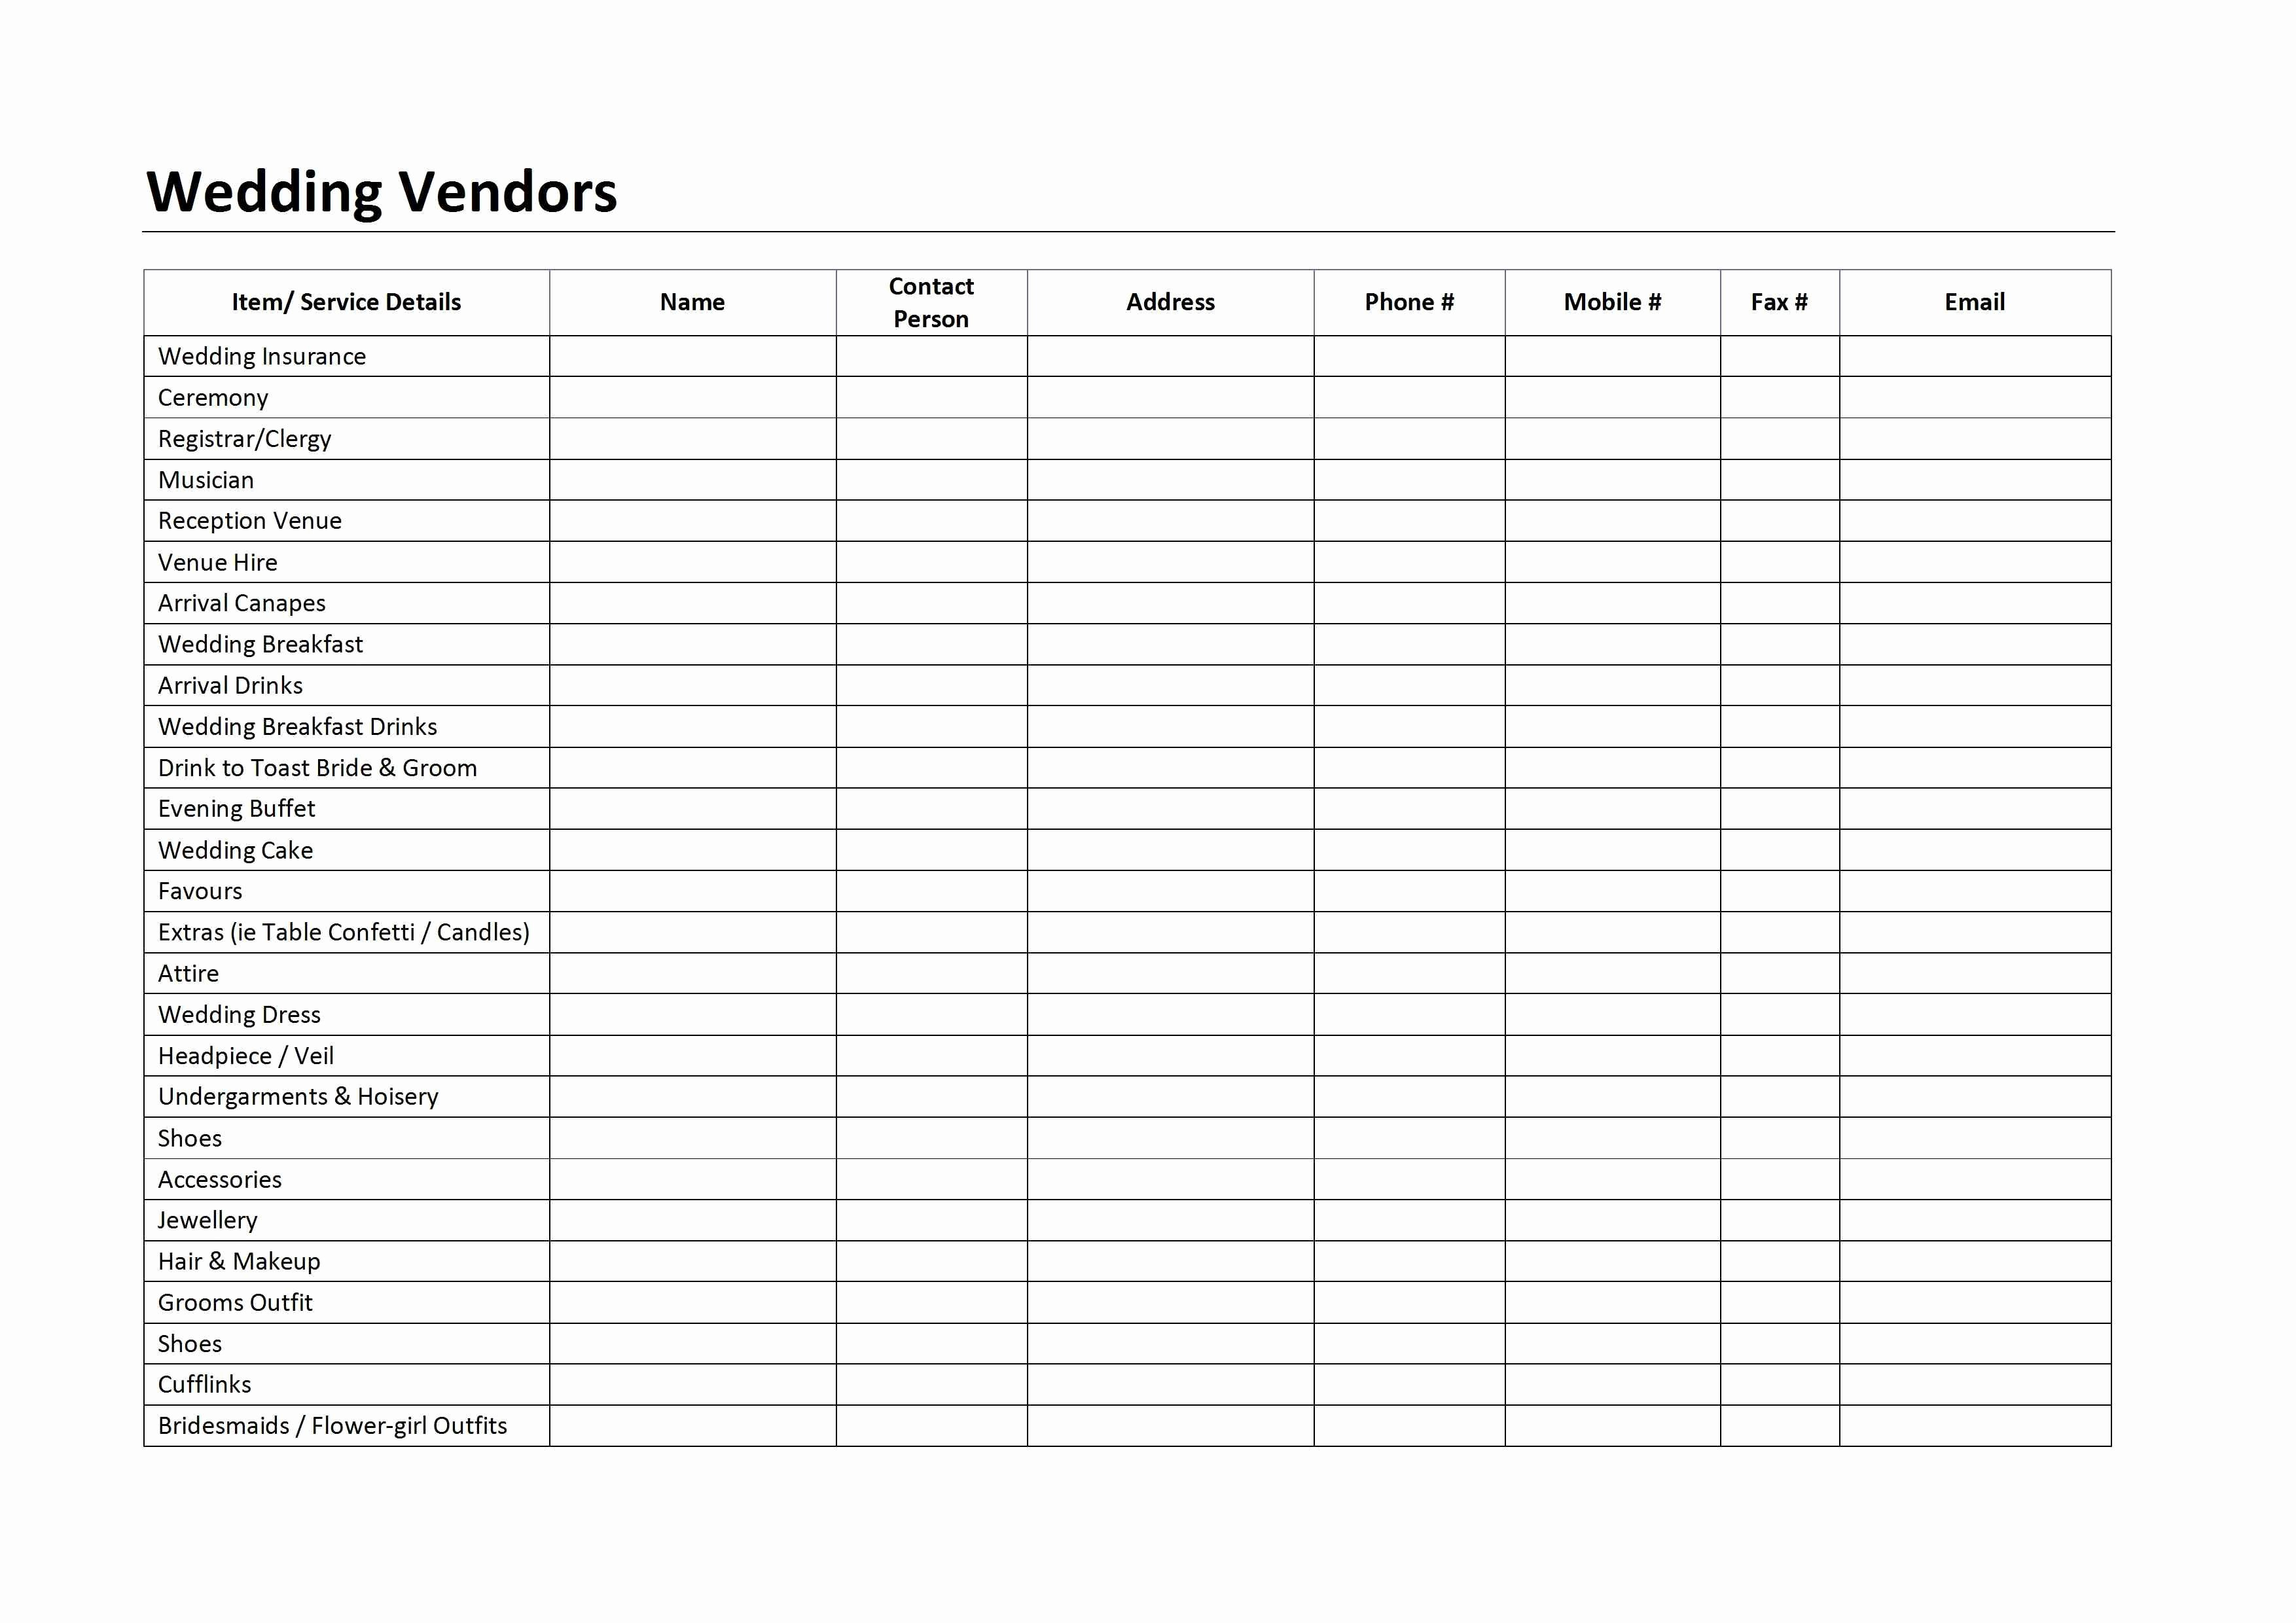 Wedding Vendor List Template Unique Wedding Vendors